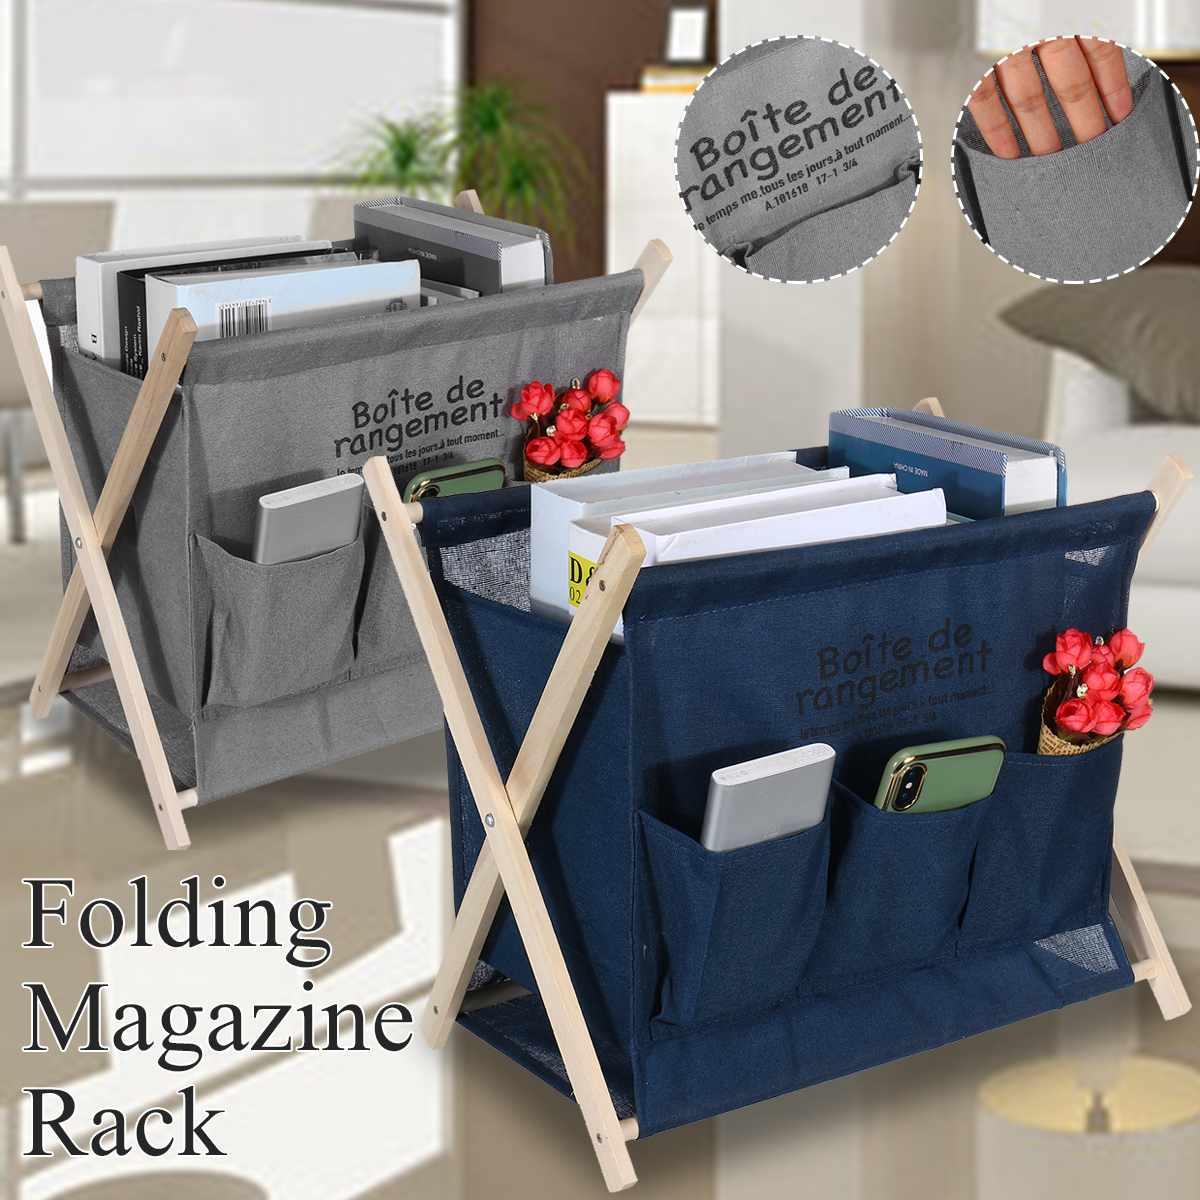 X-shape Foldable Magazine Book Basket Organizer Printed Collapsible 1 Grid Home Laundry Hamper Sorter Laundry Basket